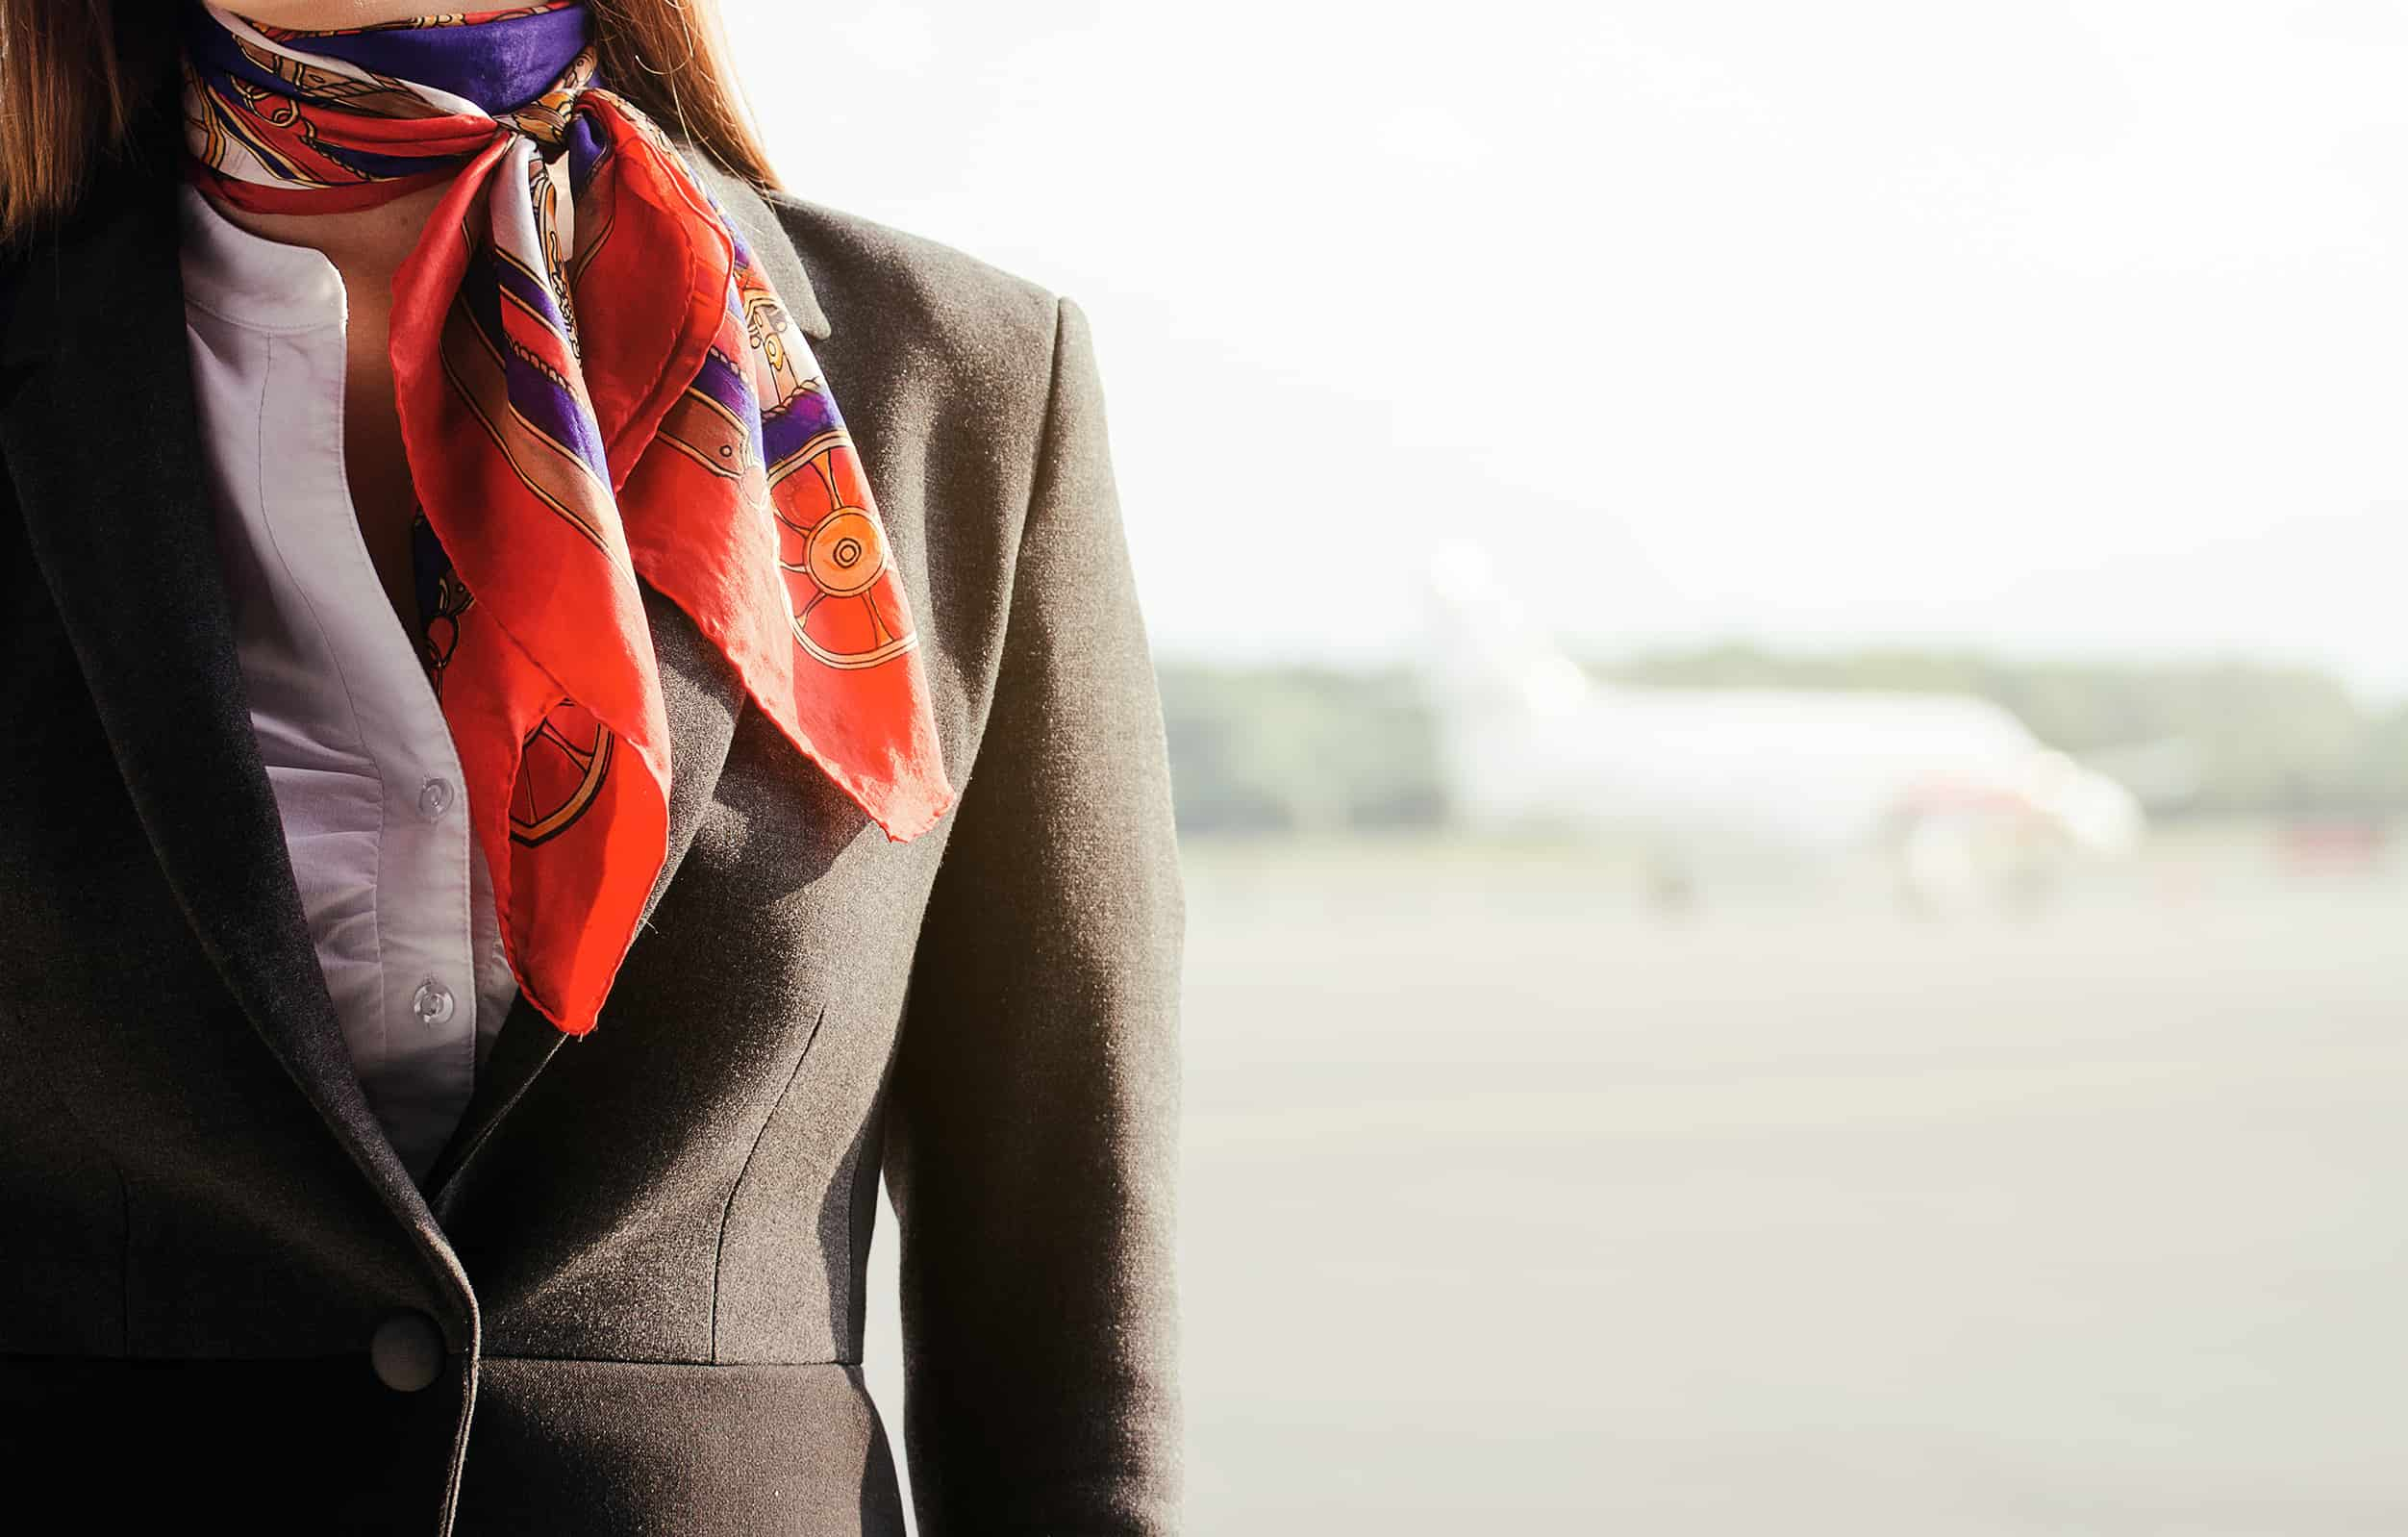 toxic airline uniform